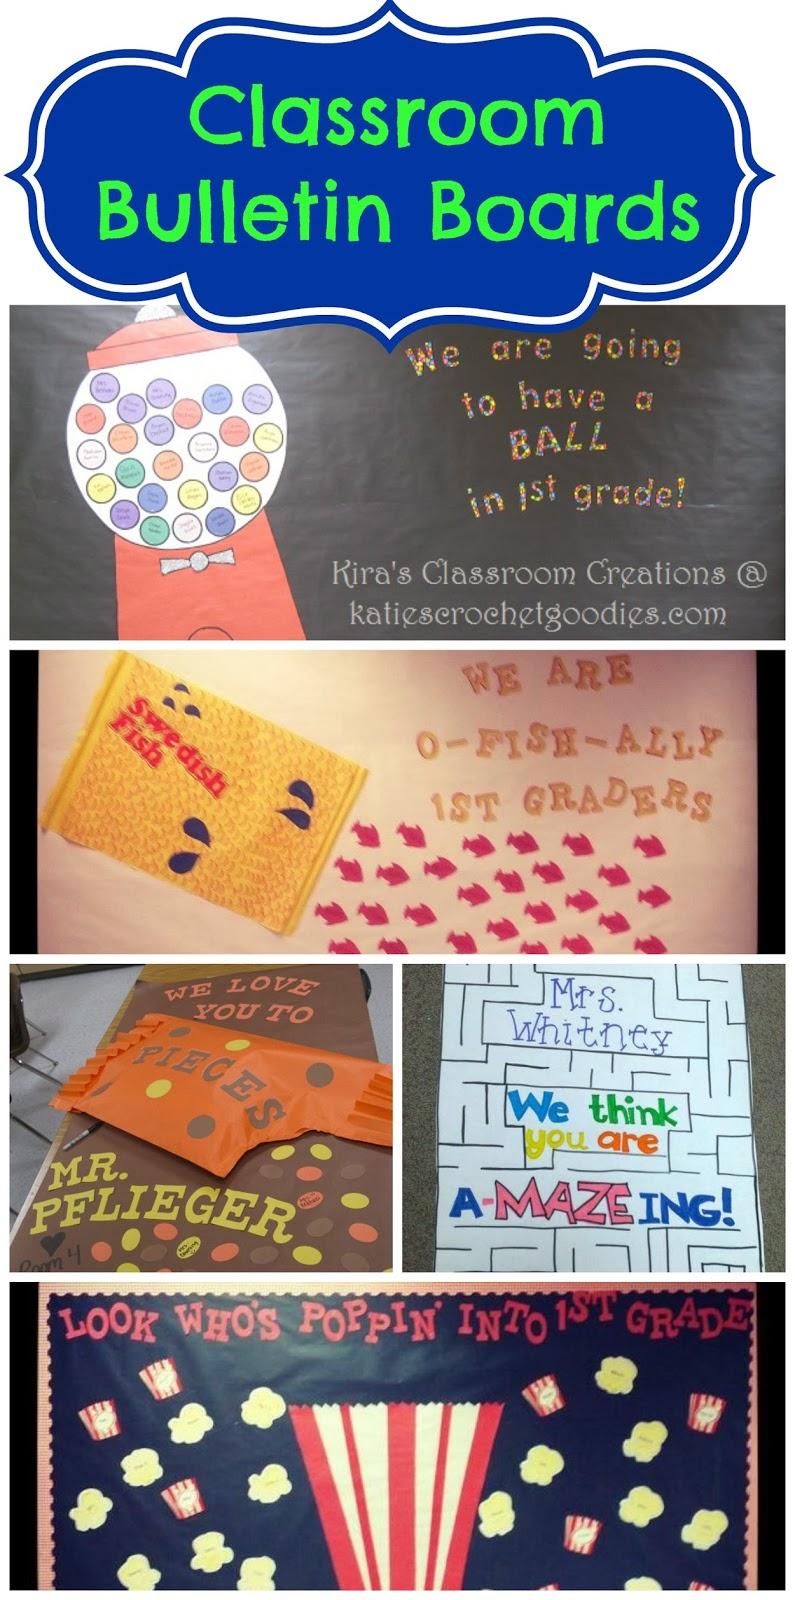 Thanksgiving Classroom Decoration ~ Classroom bulletin board poster inspiration katie s